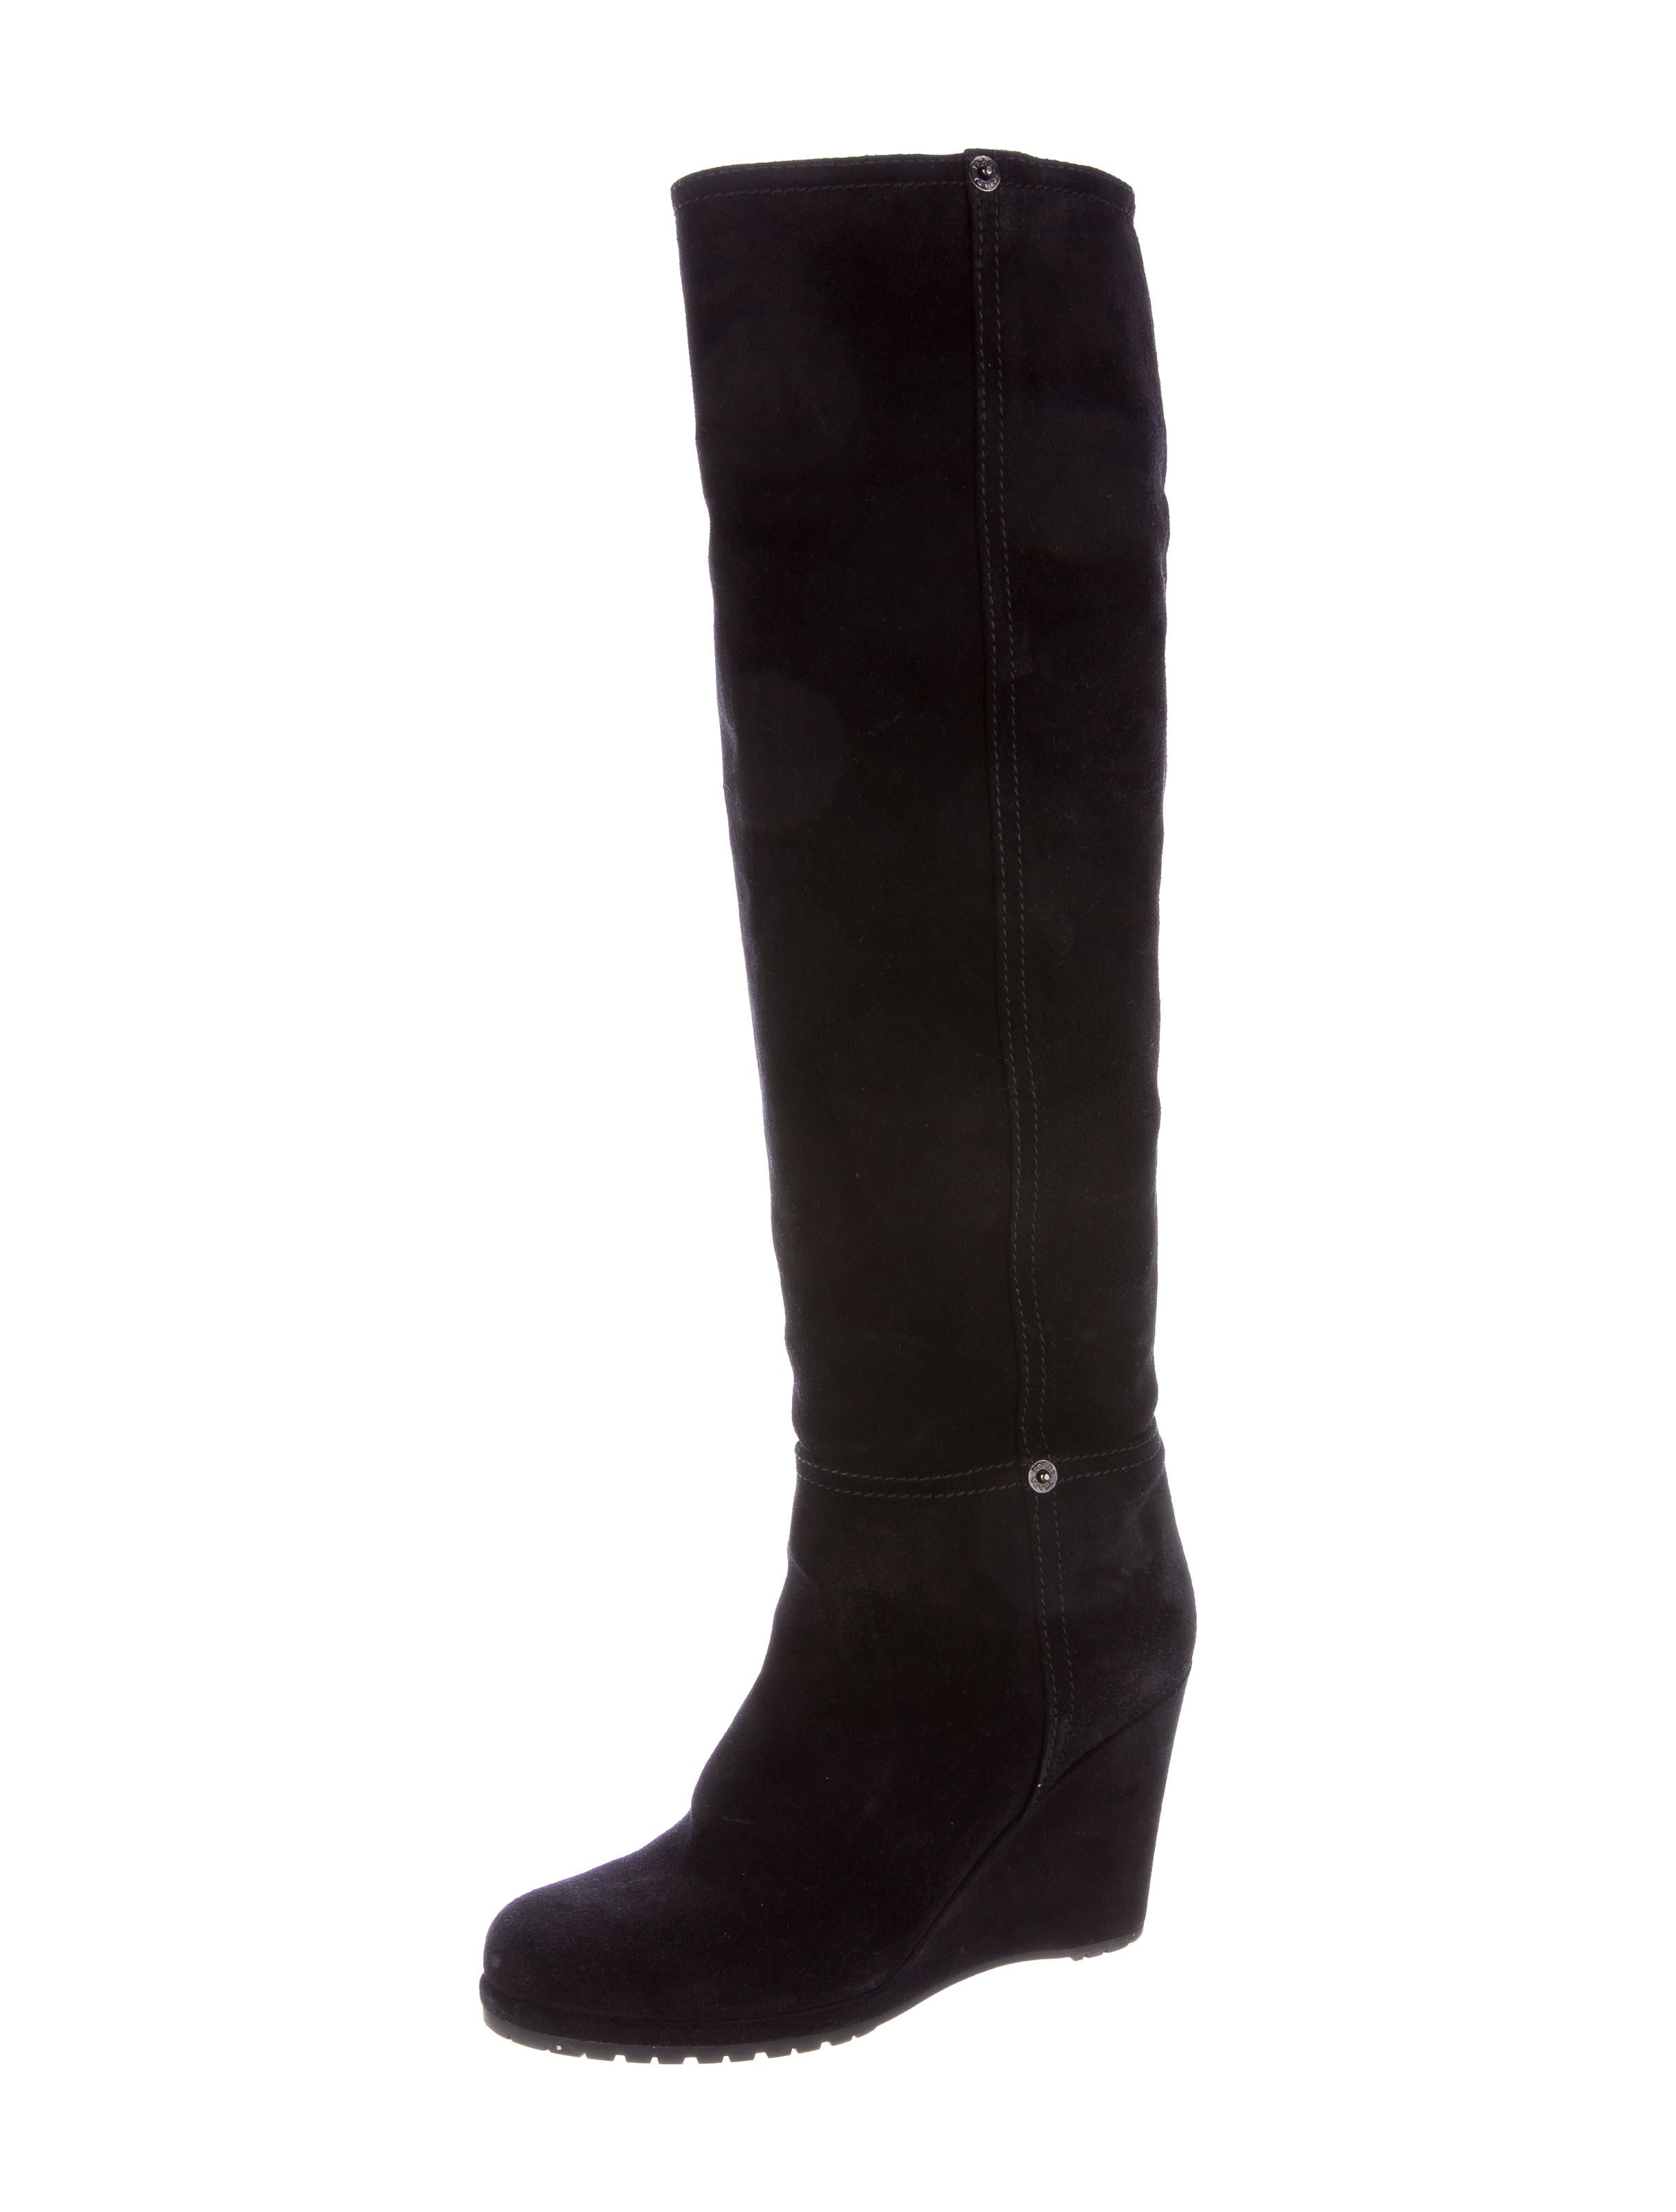 prada sport suede wedge knee high boots shoes wpr39300